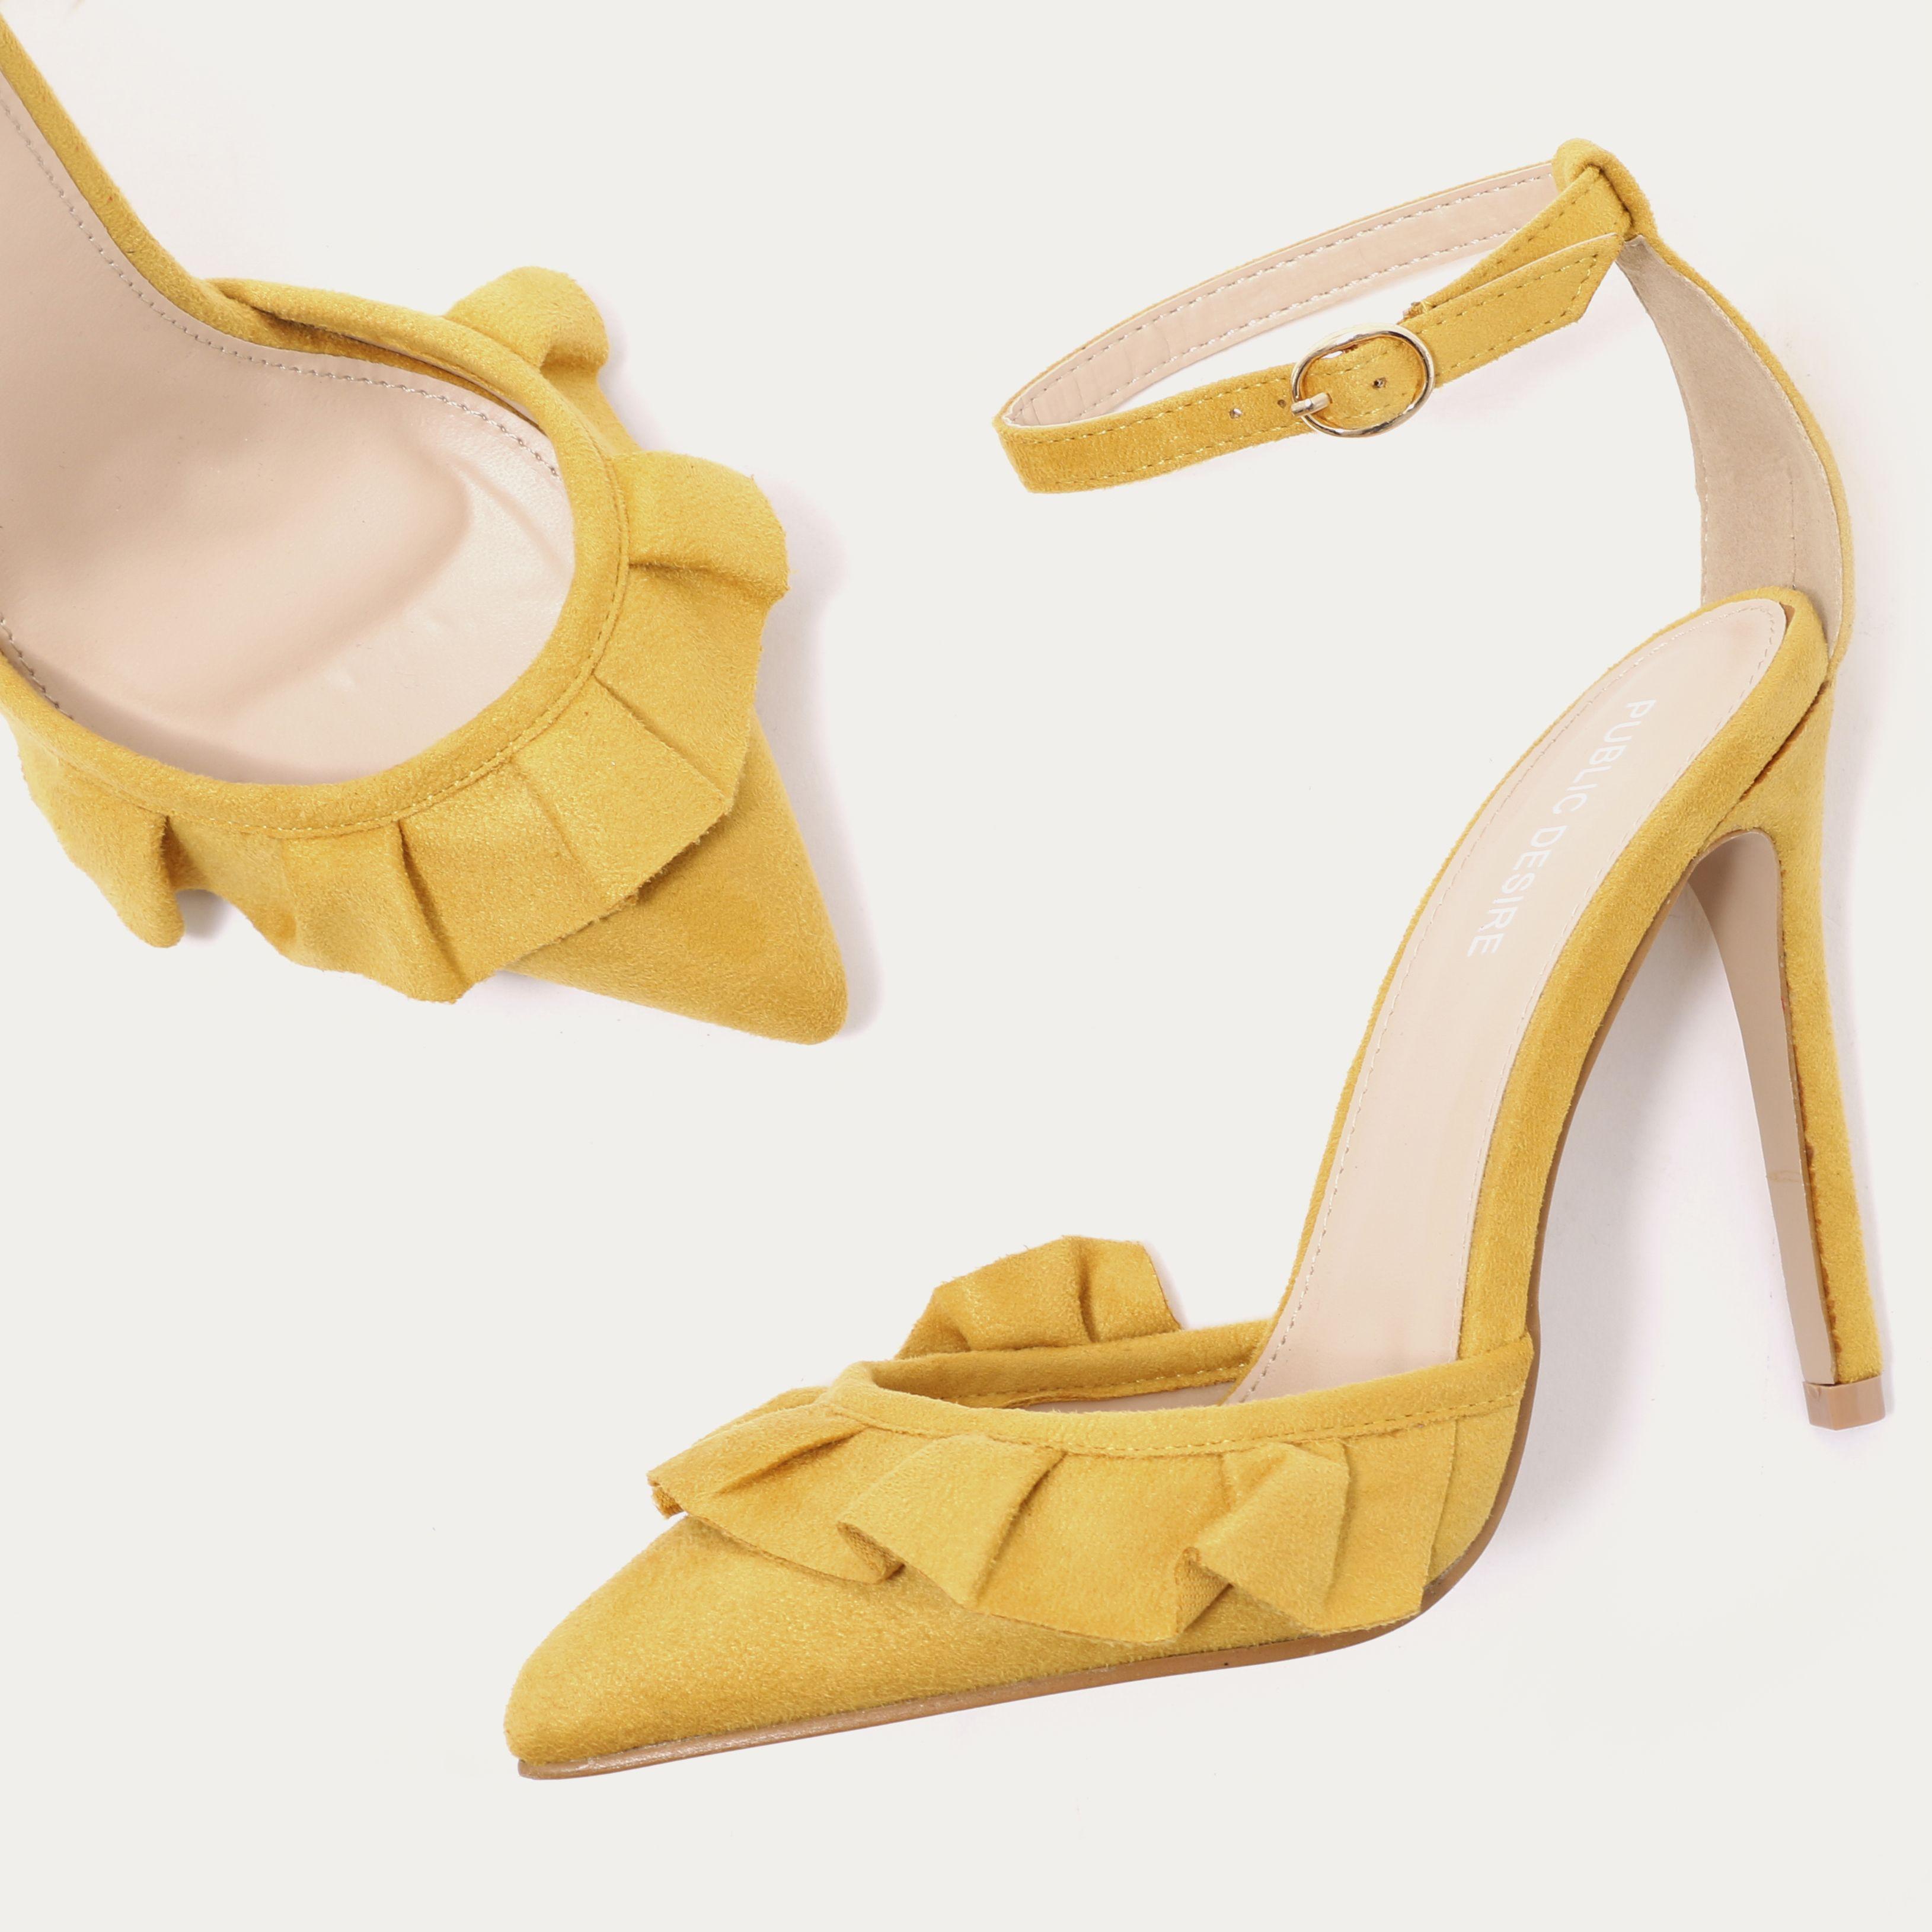 7cc52602b27 Habit Ruffle Strappy Court Heels in Mustard Faux Suede